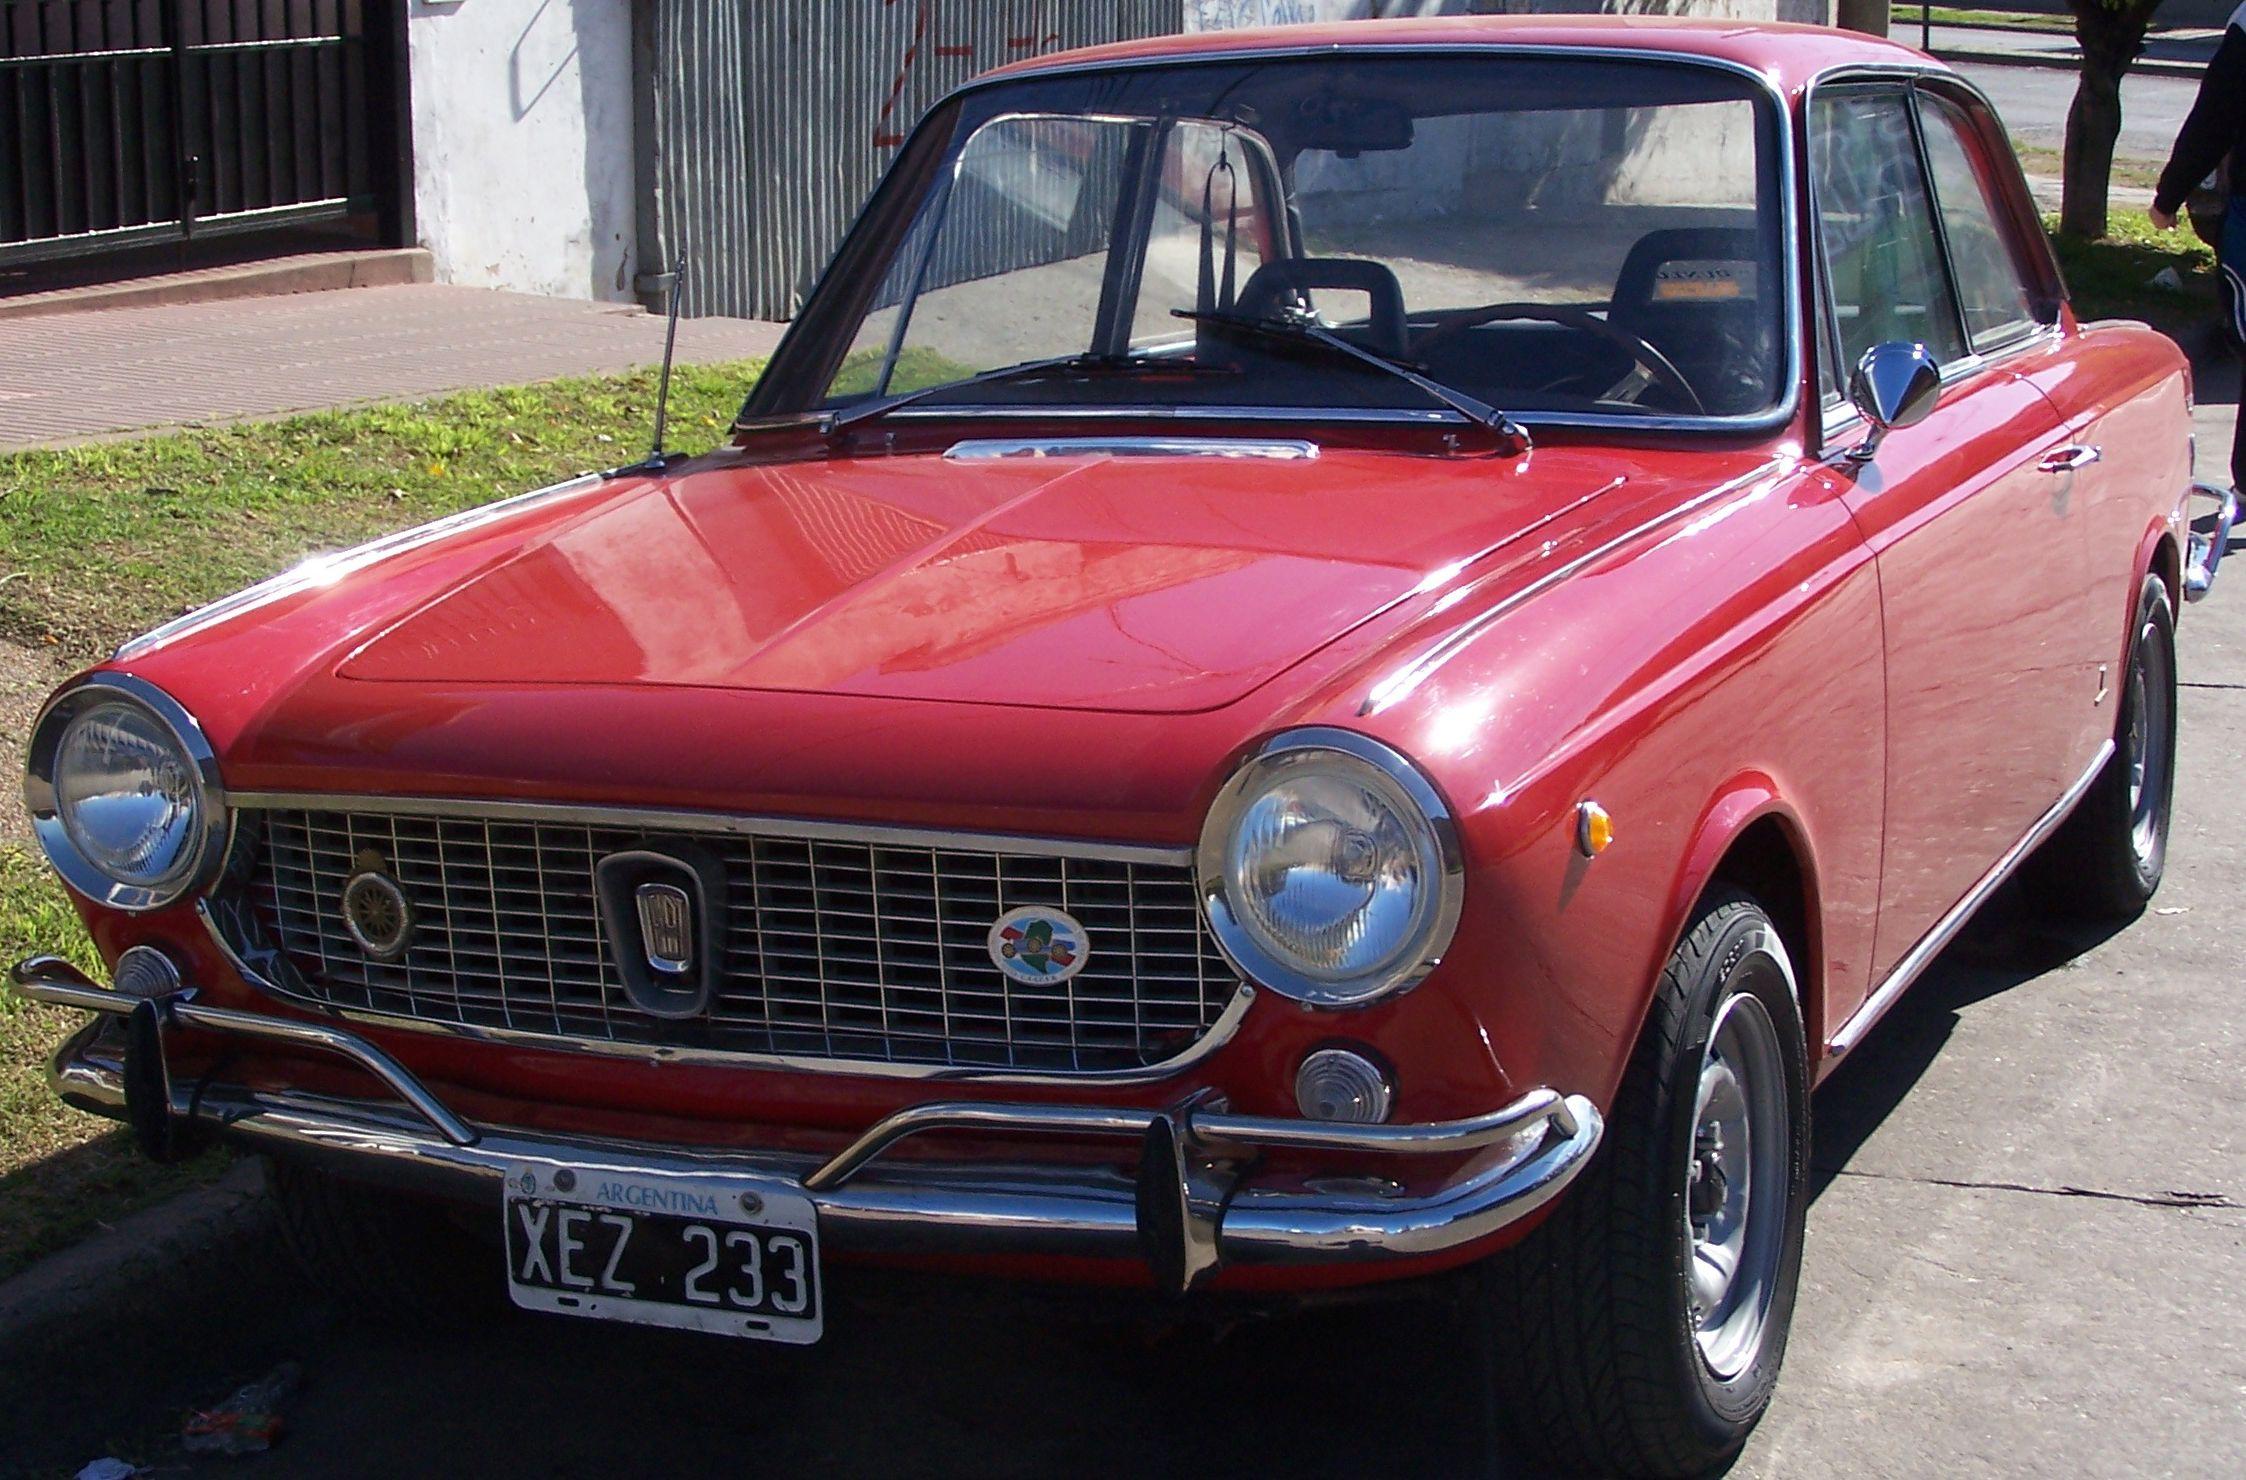 Fiat 1500 Coupé año 1967. Motor, embrague, tren delantero, tren trasero, tanque nafta, escape, tapizado y pintura a cero muy original. http://www.arcar.org/fiat-1500-coupe-45457